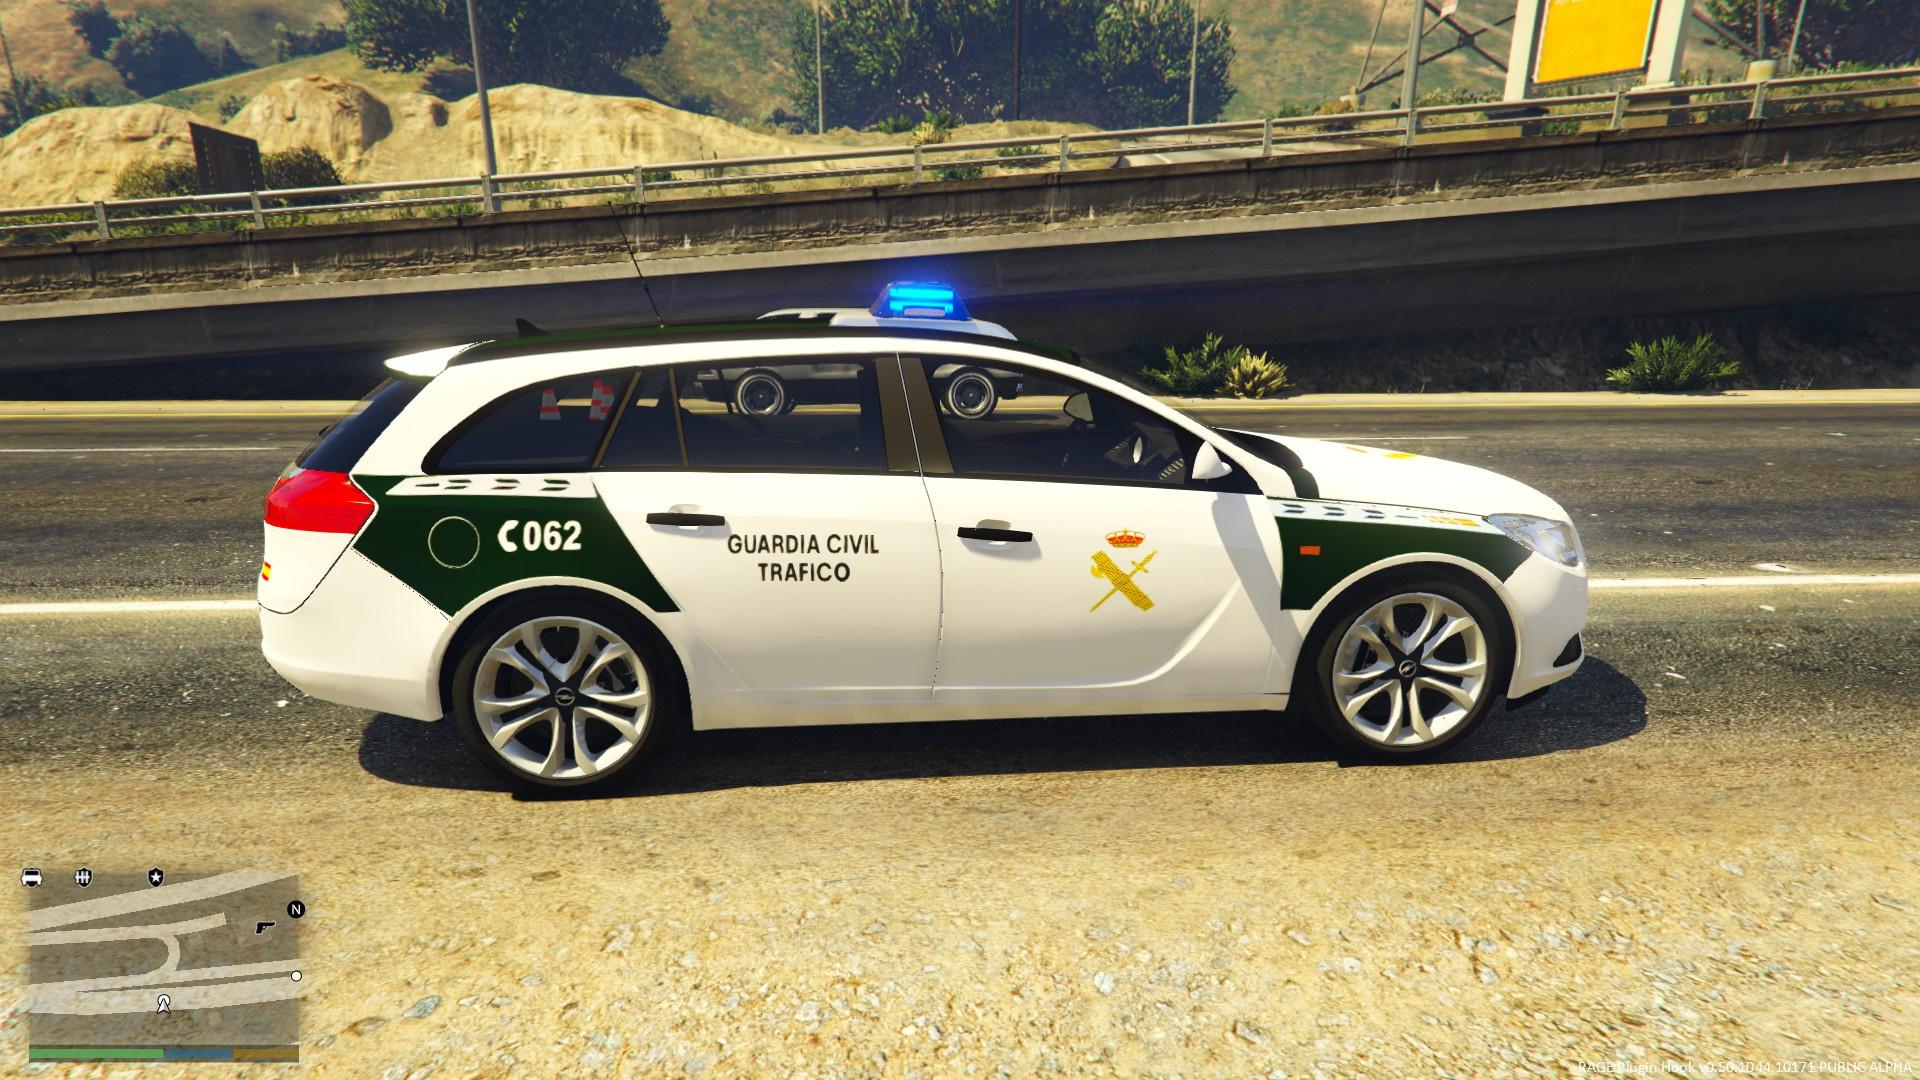 opel insignia guardia civil trafico españa - gta5-mods